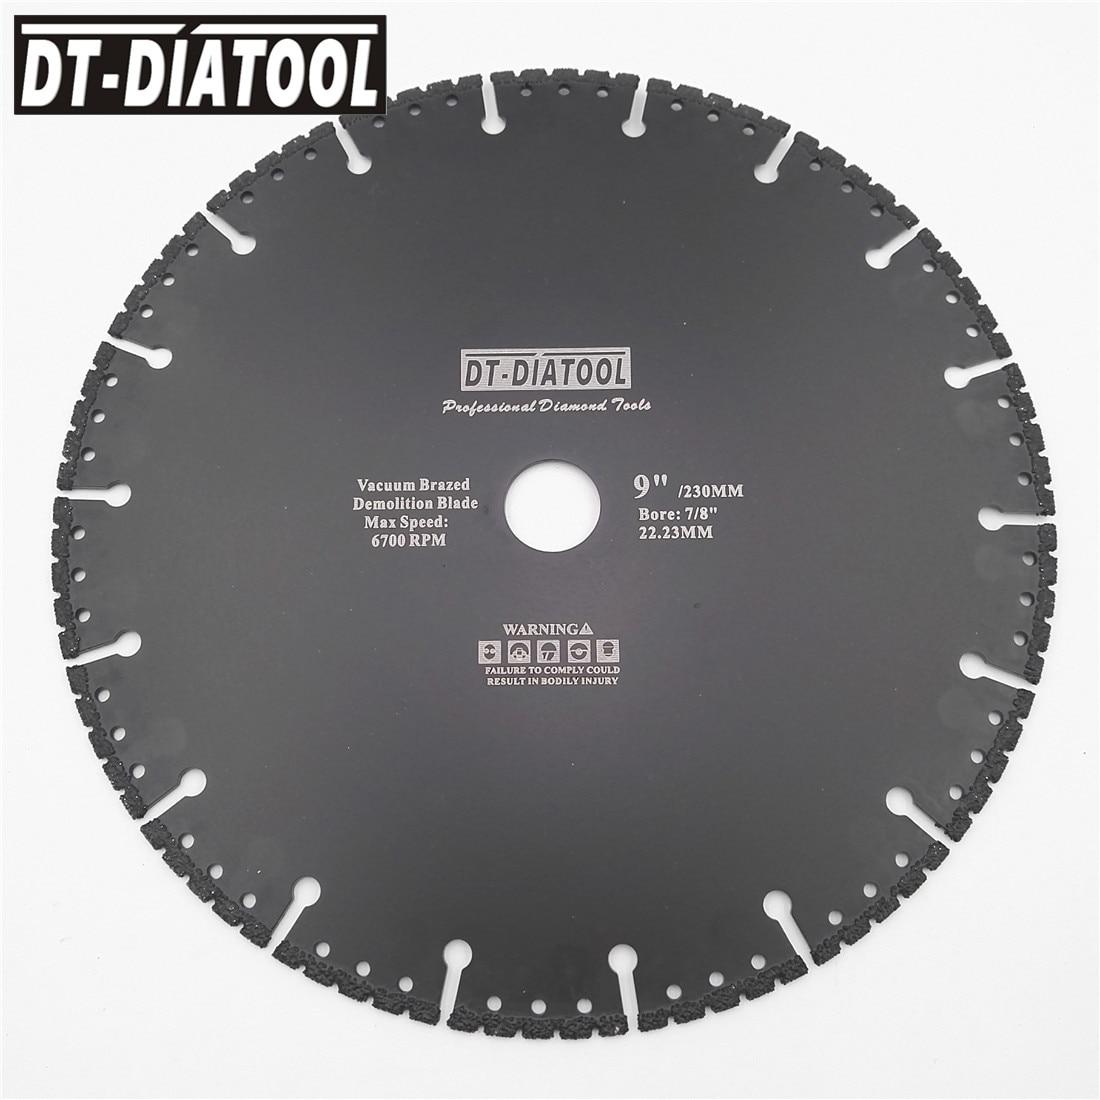 DT-DIATOOL 1pc 230mm/9